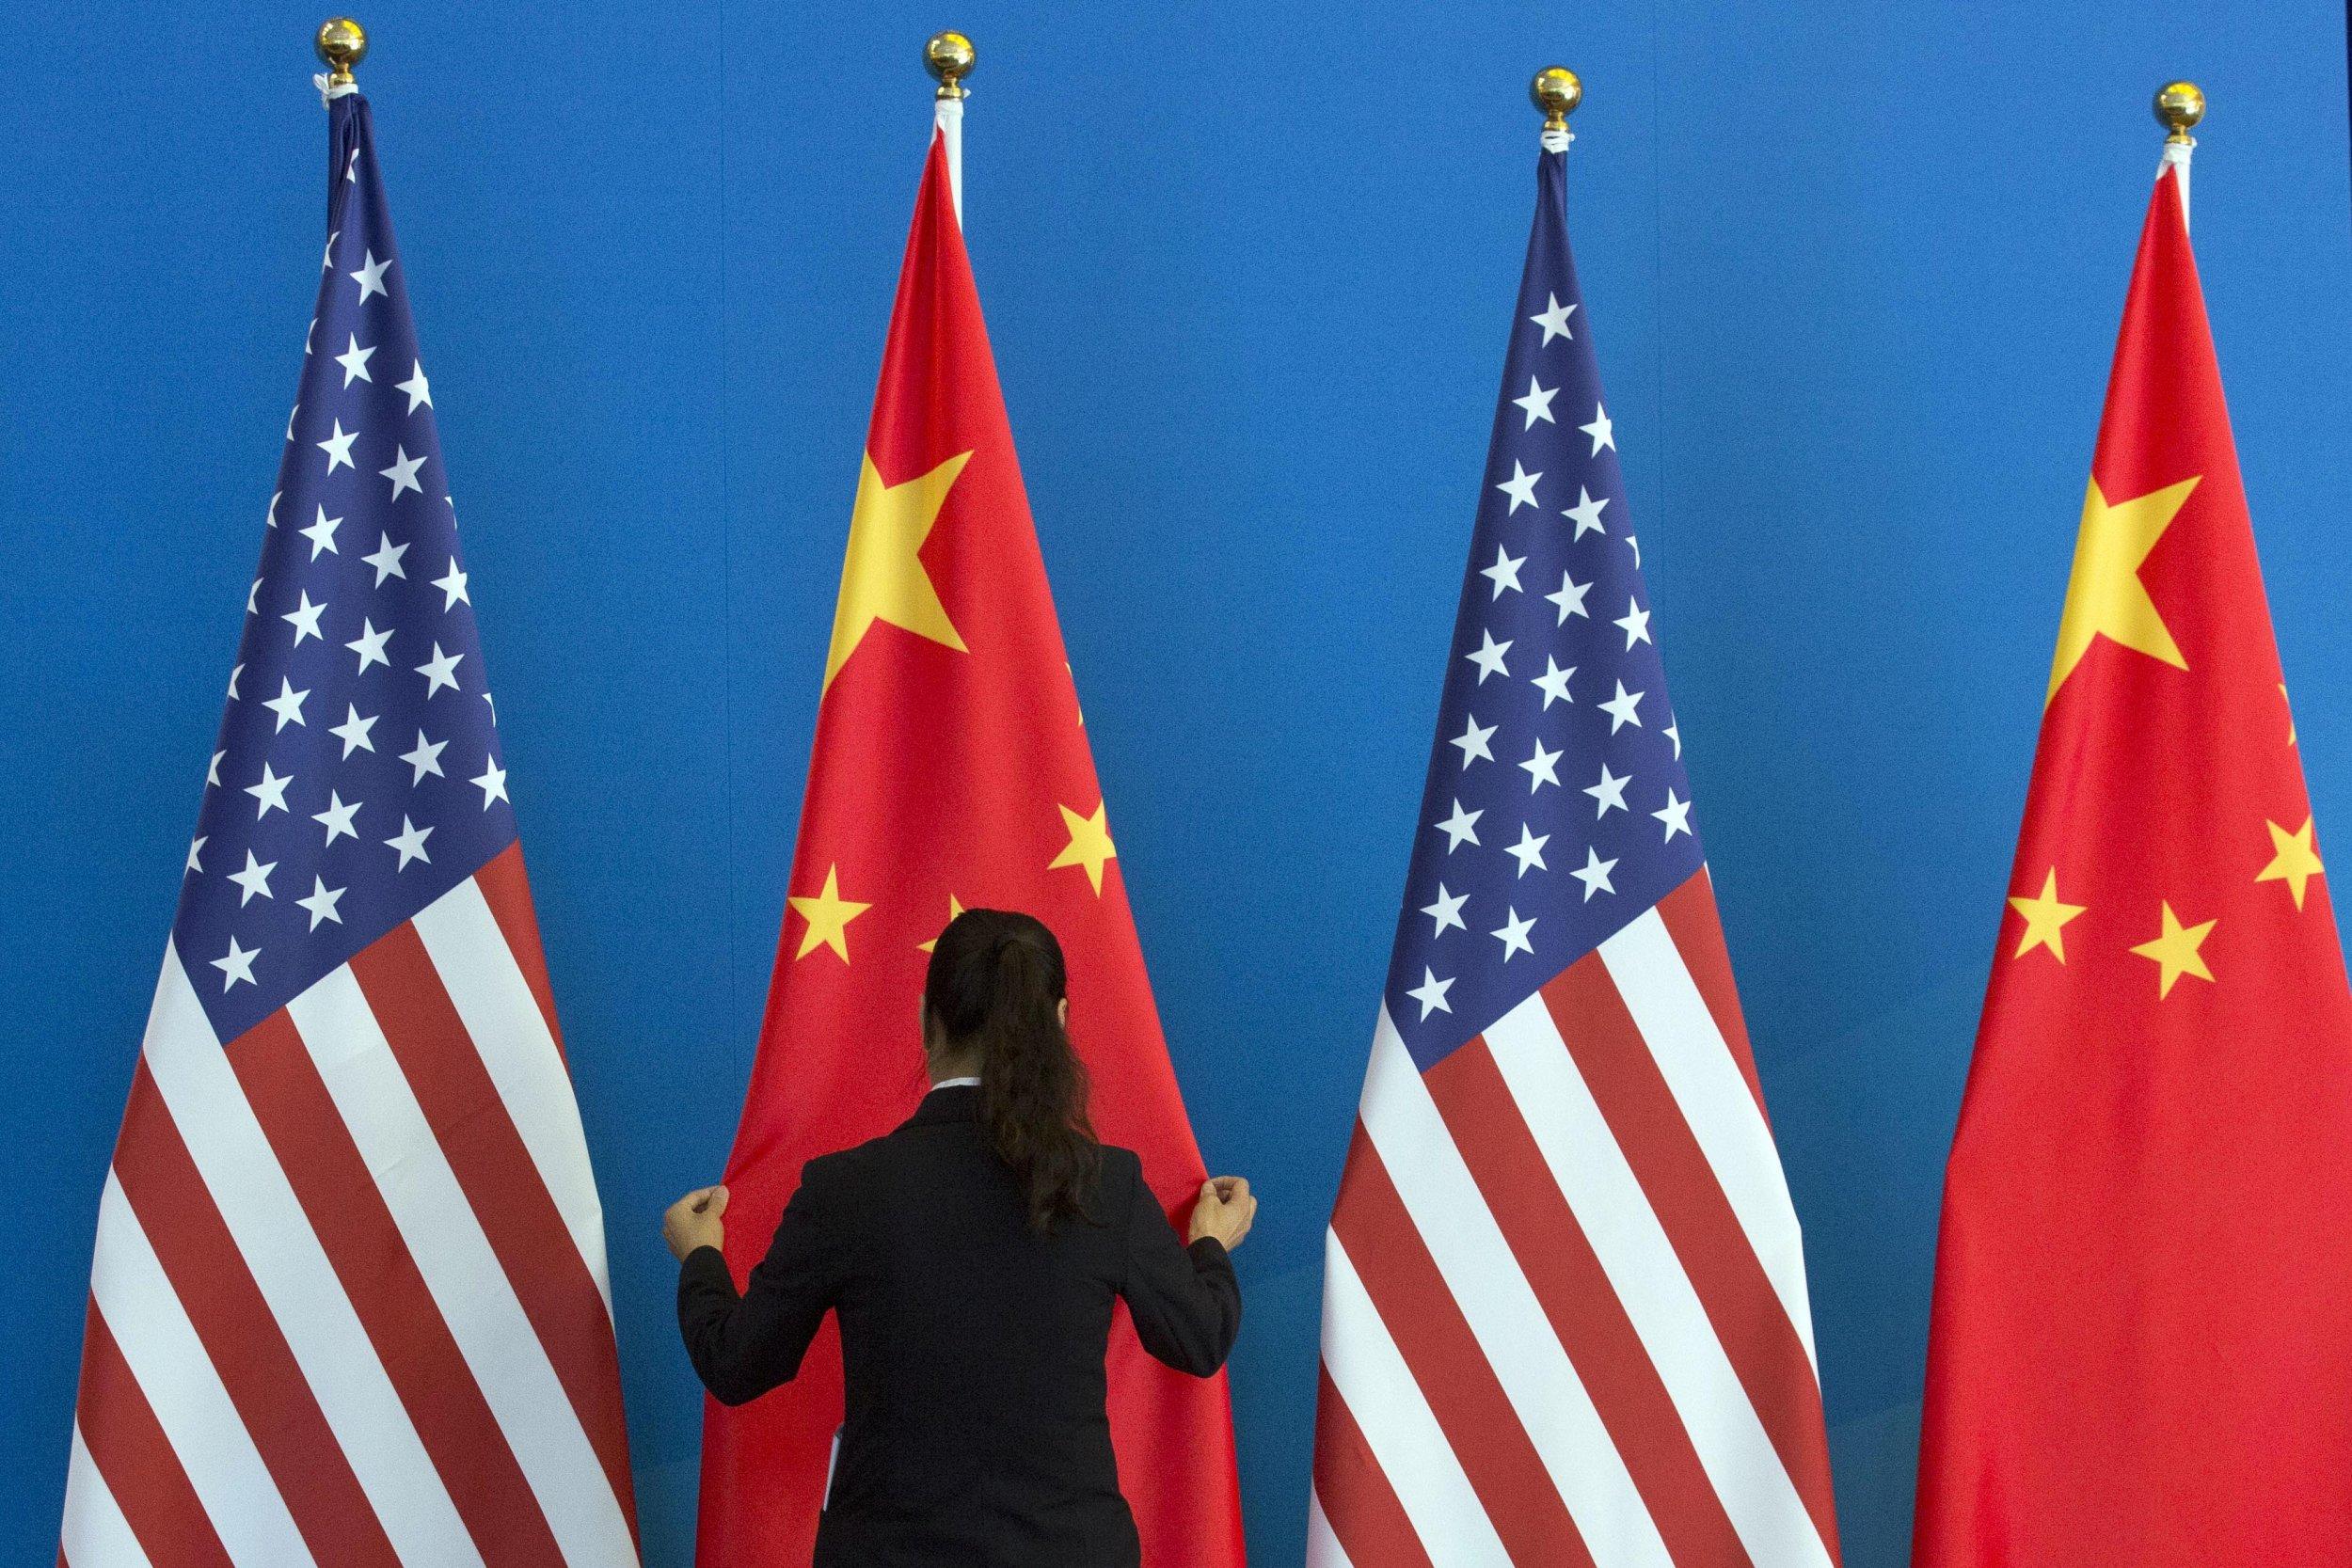 China America trade war tariffs kung fu deadly punch